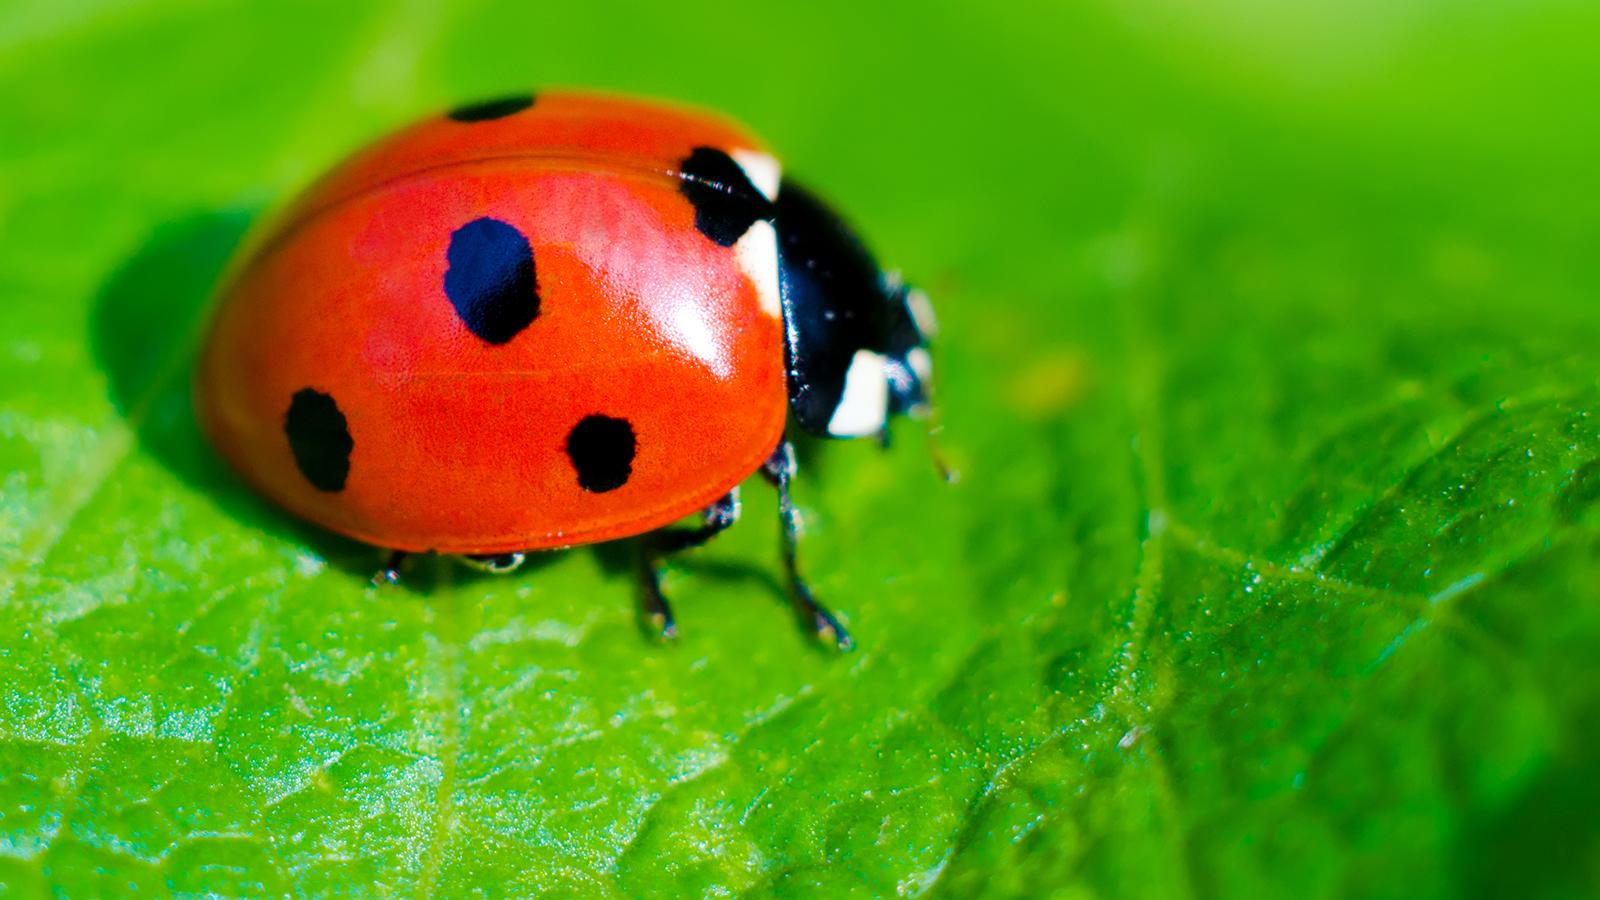 HQ Ladybug Wallpapers | File 1044.57Kb